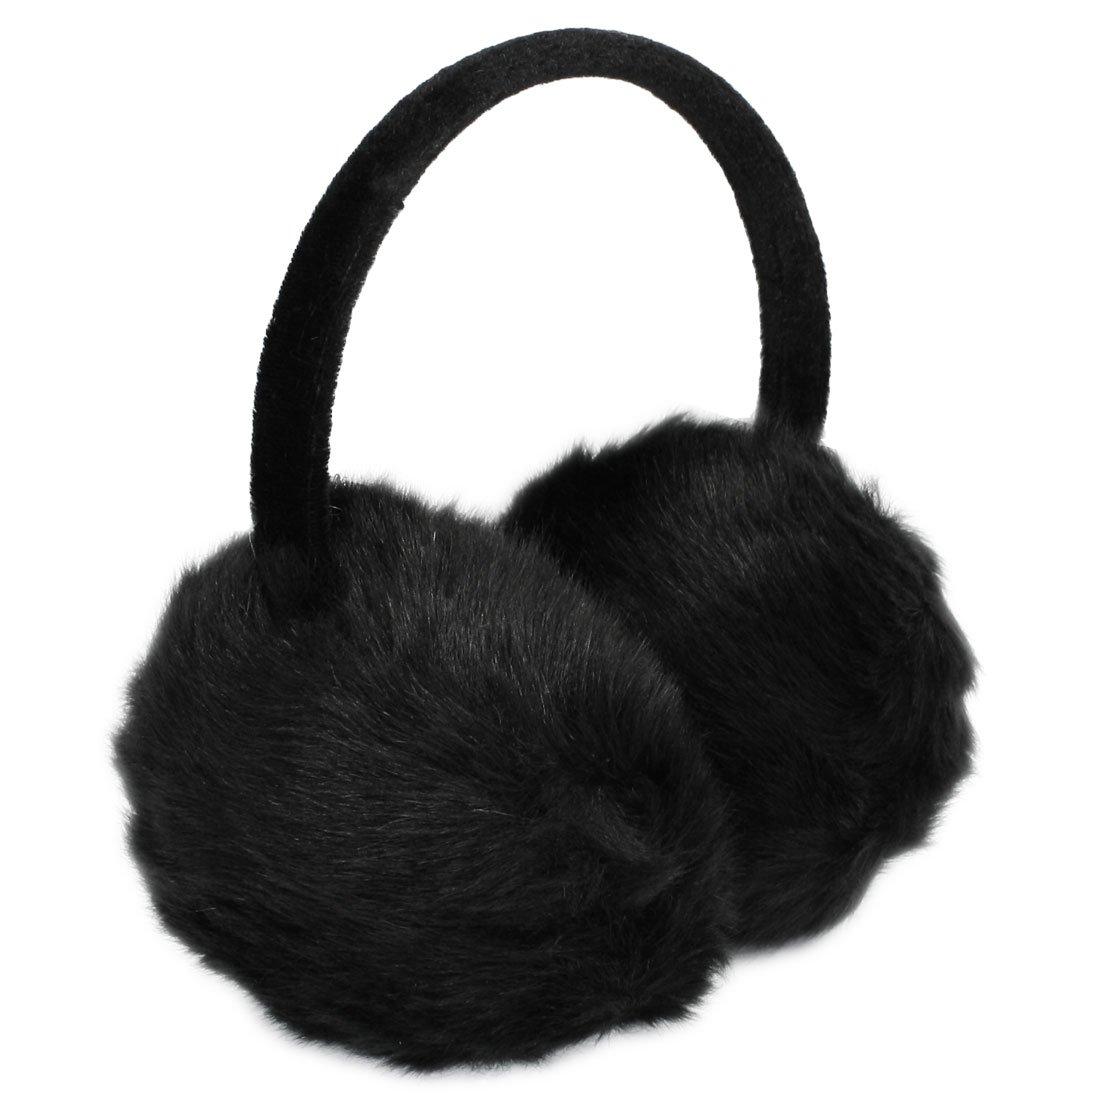 h1 lady woman headband black faux fur winter ear cover. Black Bedroom Furniture Sets. Home Design Ideas